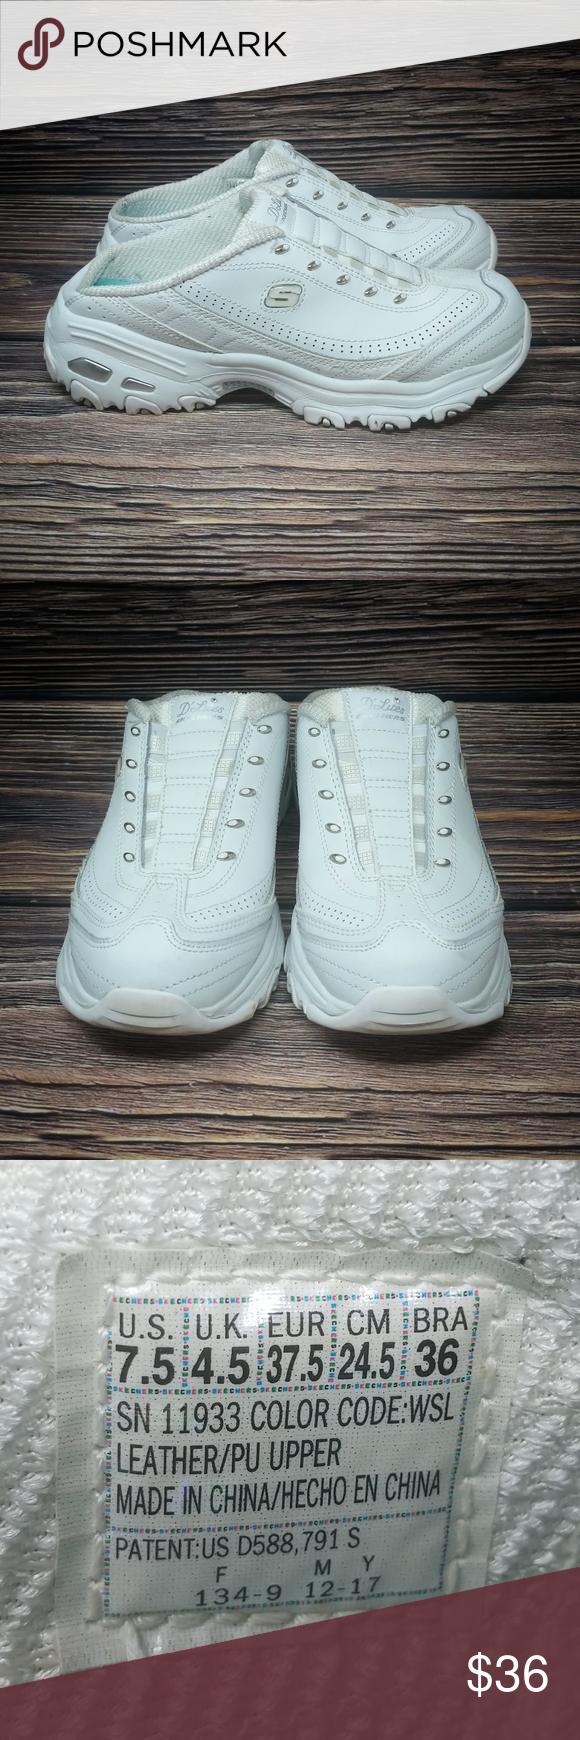 Skechers D'Lites Resilient Slip on Clogs Mules 7.5 Skechers